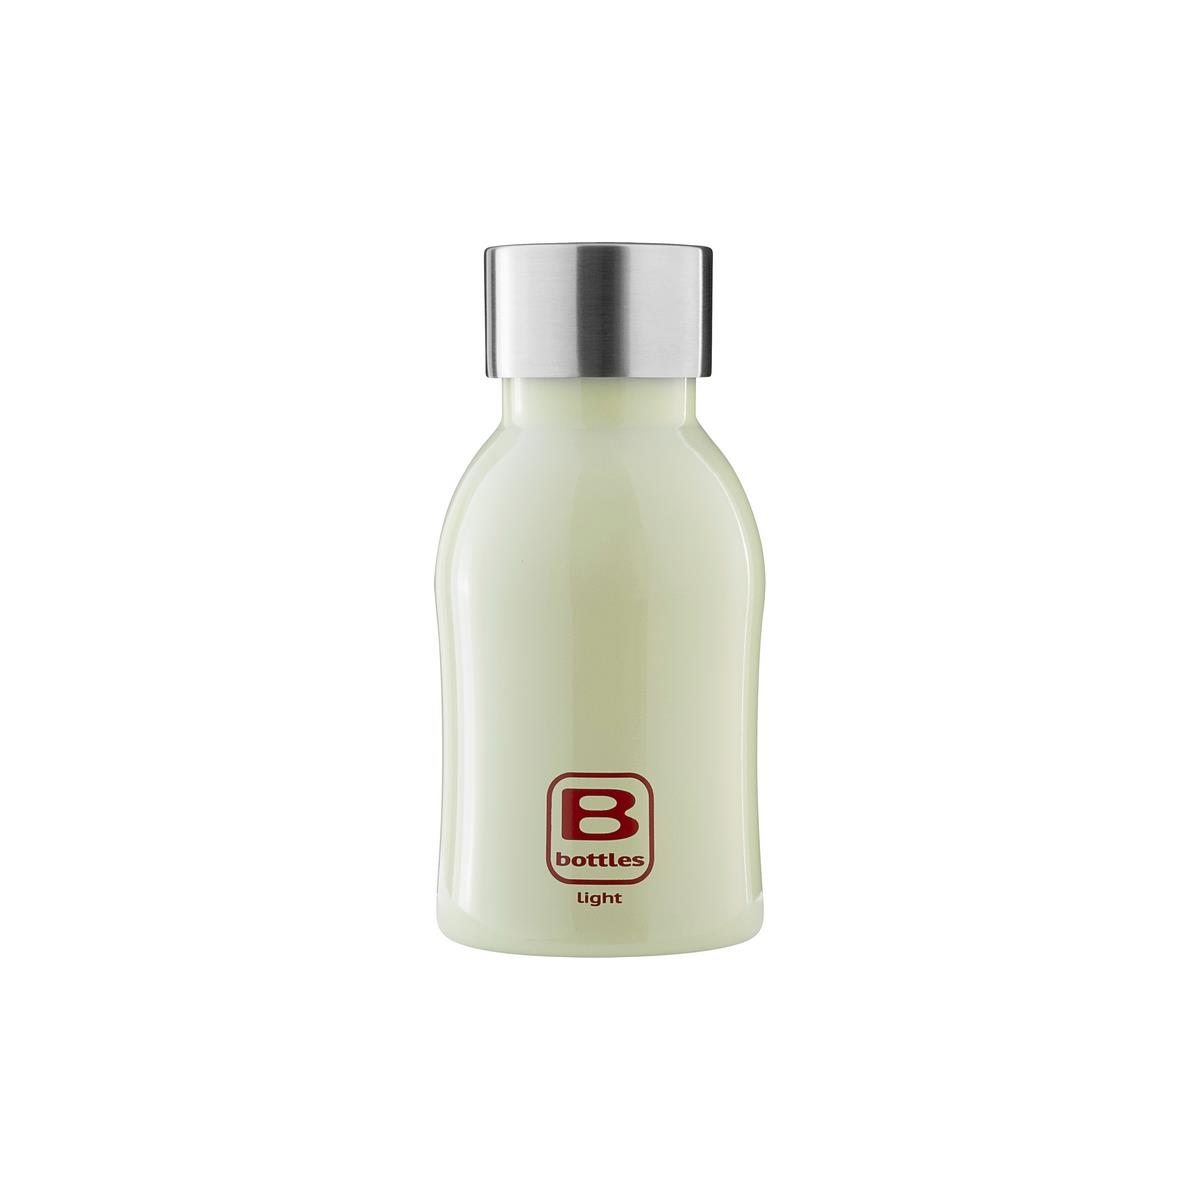 B Bottles Light - Light Green - 350 ml - Bottiglia in acciaio inox 18/10 ultra leggera e compatta